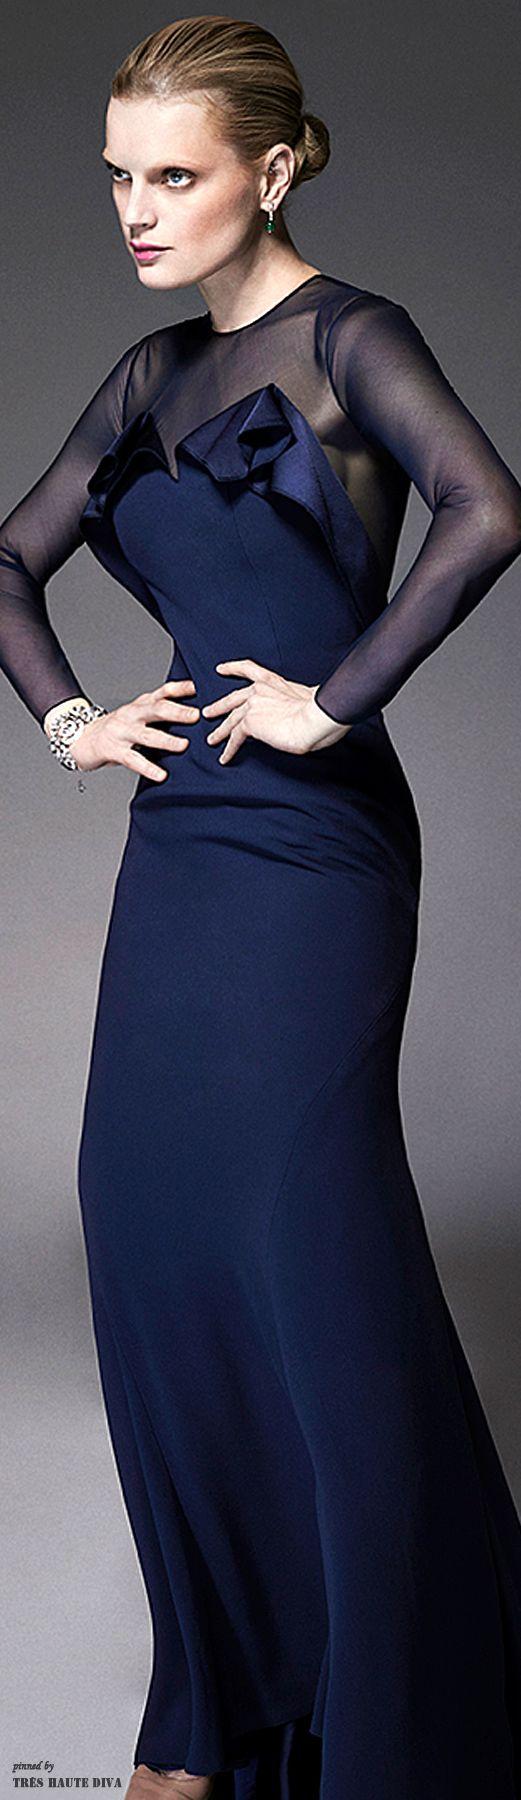 Harga Dan Spesifikasi Jolie Clothing Mabile Short Terbaru 2018 Yoenik Apparel Ghaby Mix Outer Gray M13450 R37s3 1192 Best Fashion Images On Pinterest Shibori Techniques Tye Dye Zac Posen